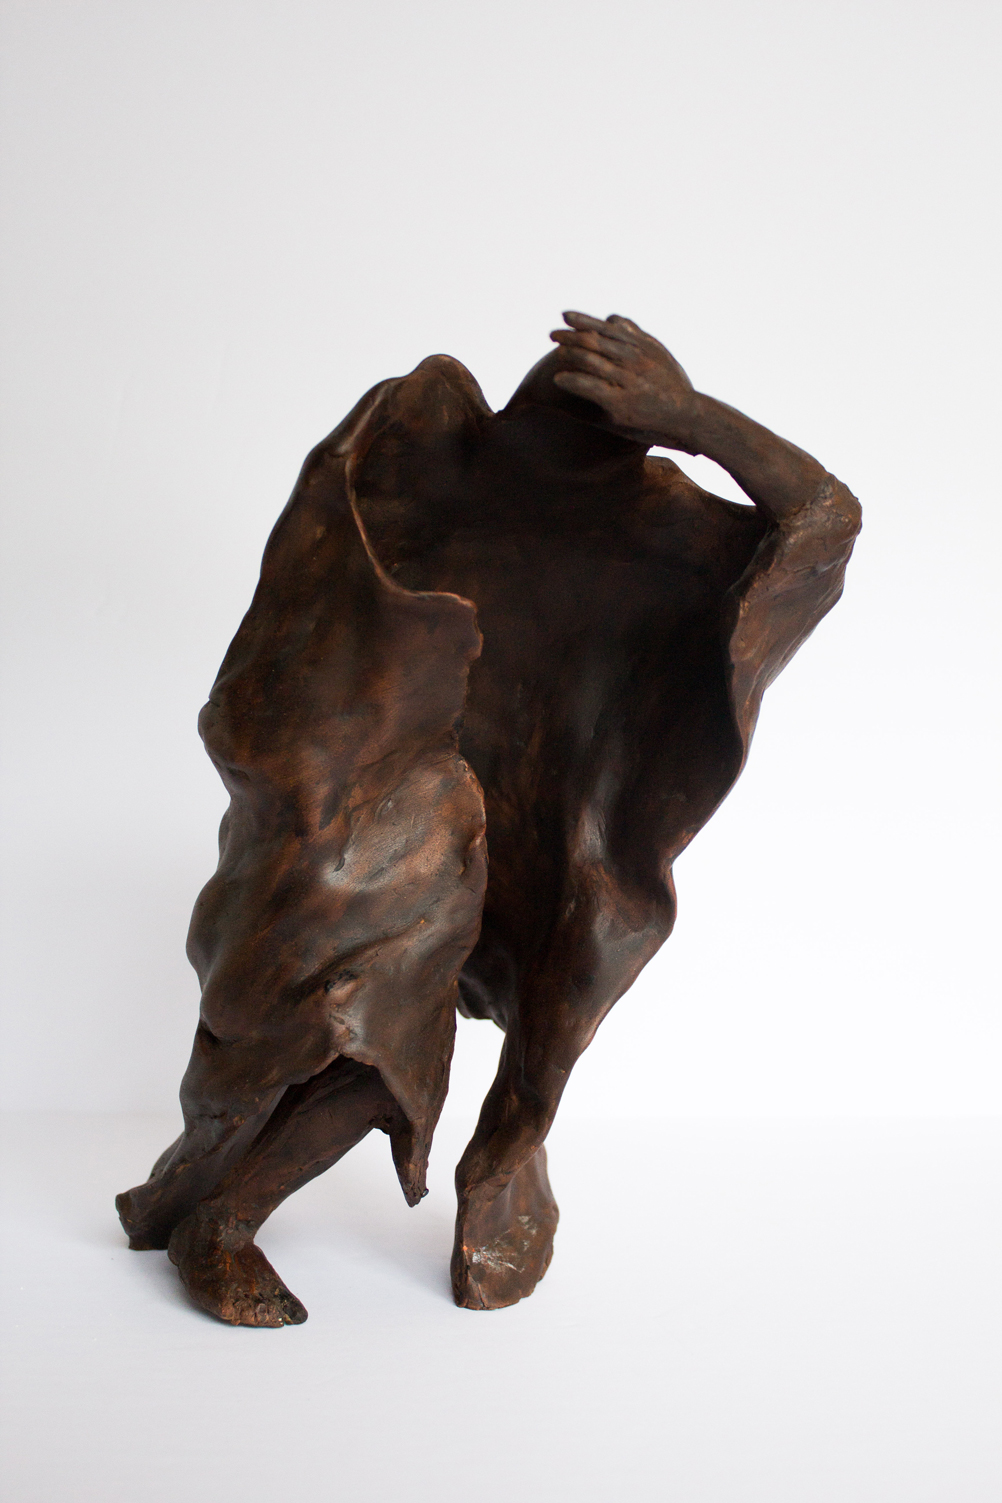 Woman Figure 25.17.15 cm painted terracotta